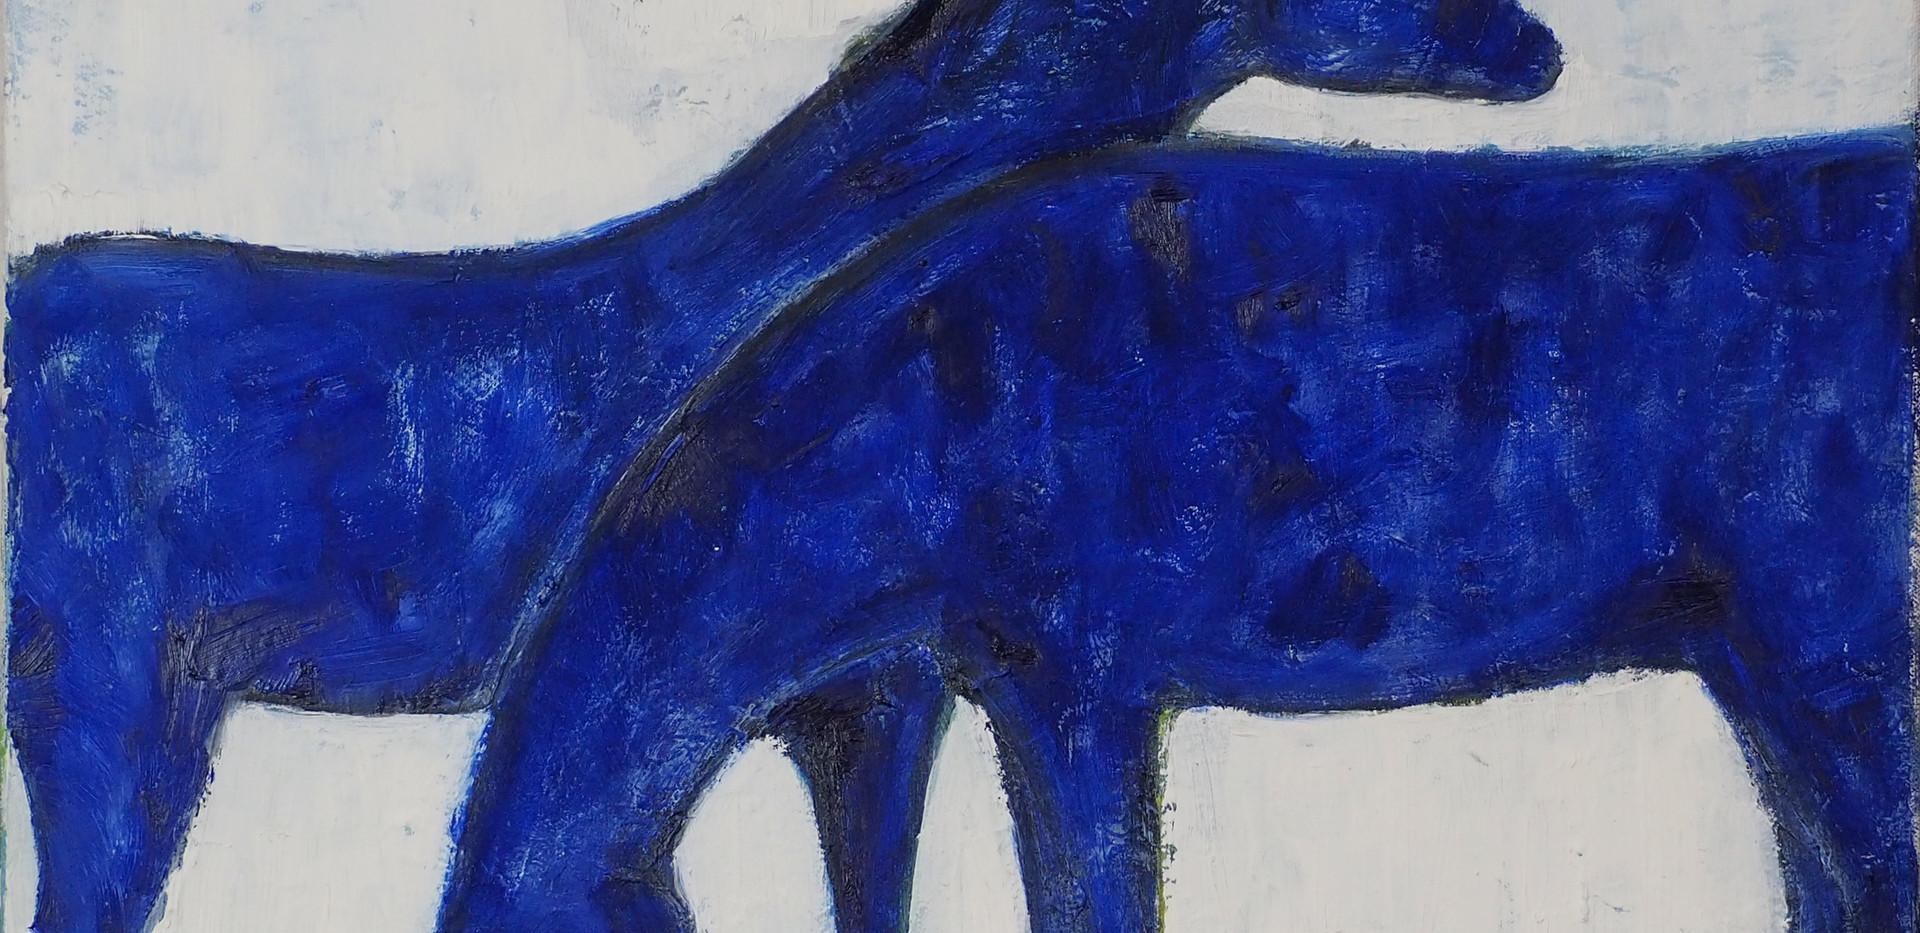 Blue Mates